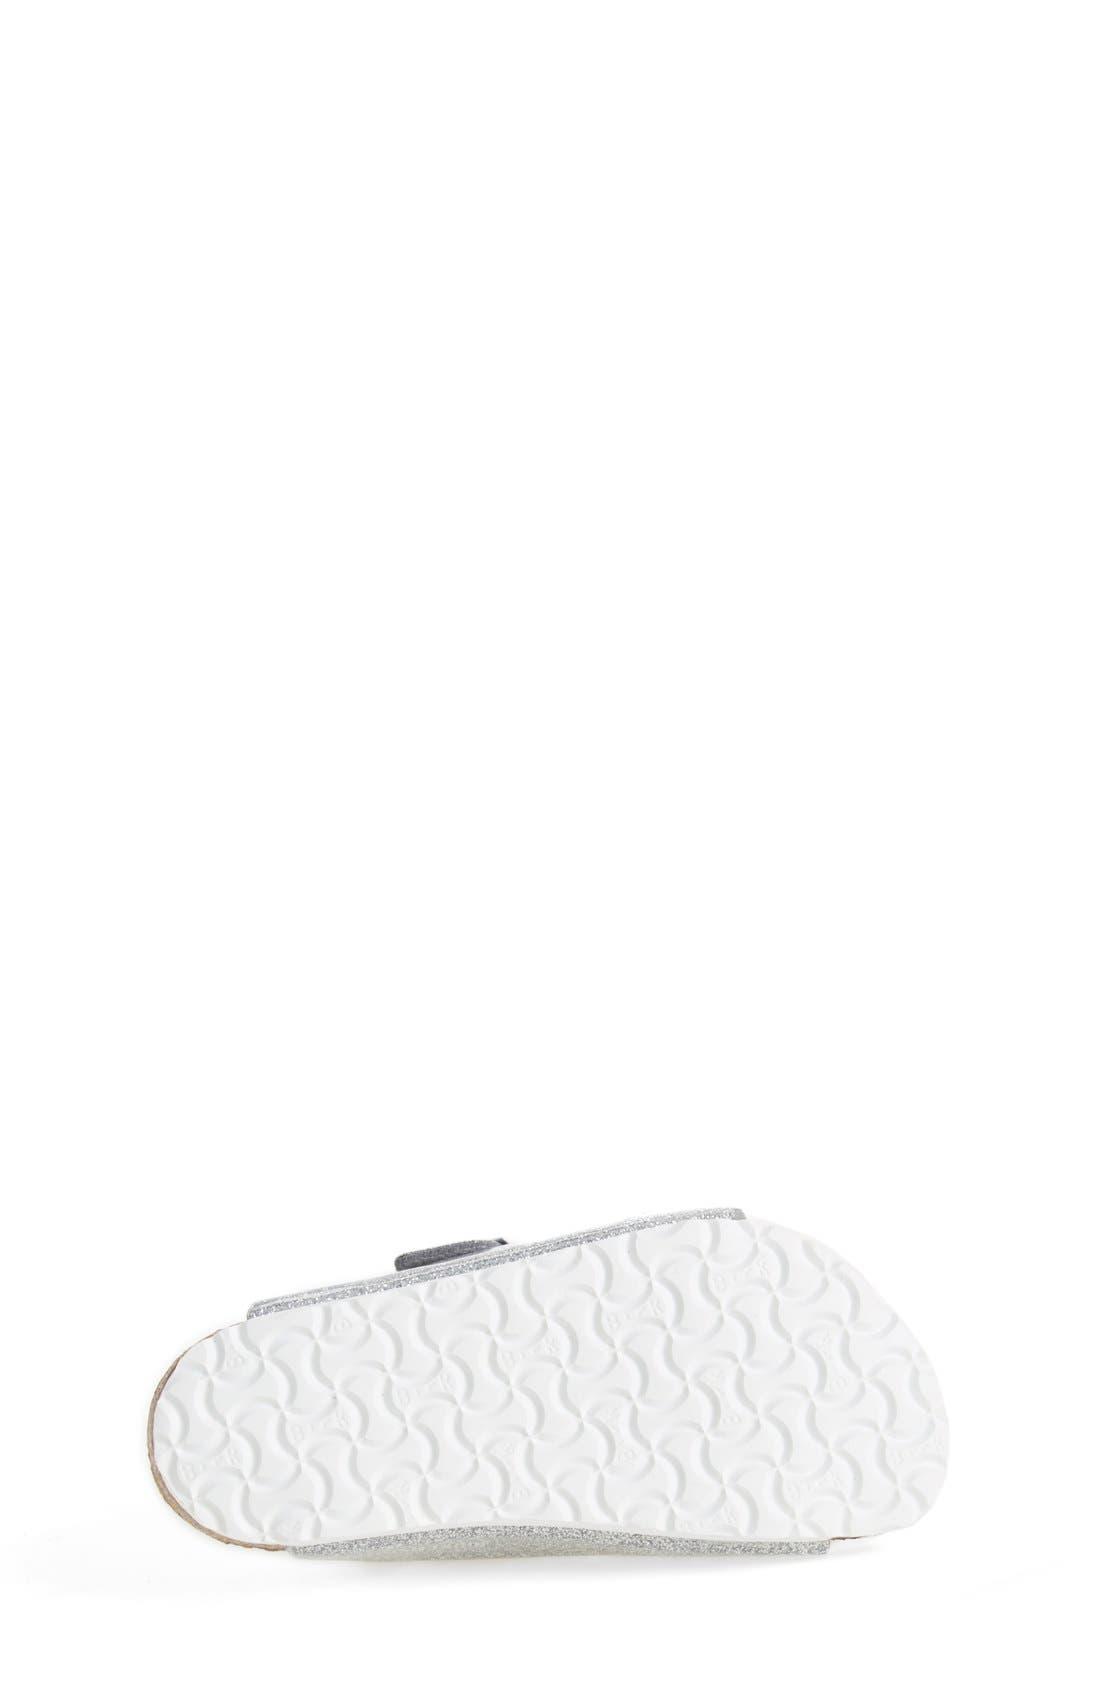 'Arizona Galaxy Birko-Flor' Slide Sandal,                             Alternate thumbnail 14, color,